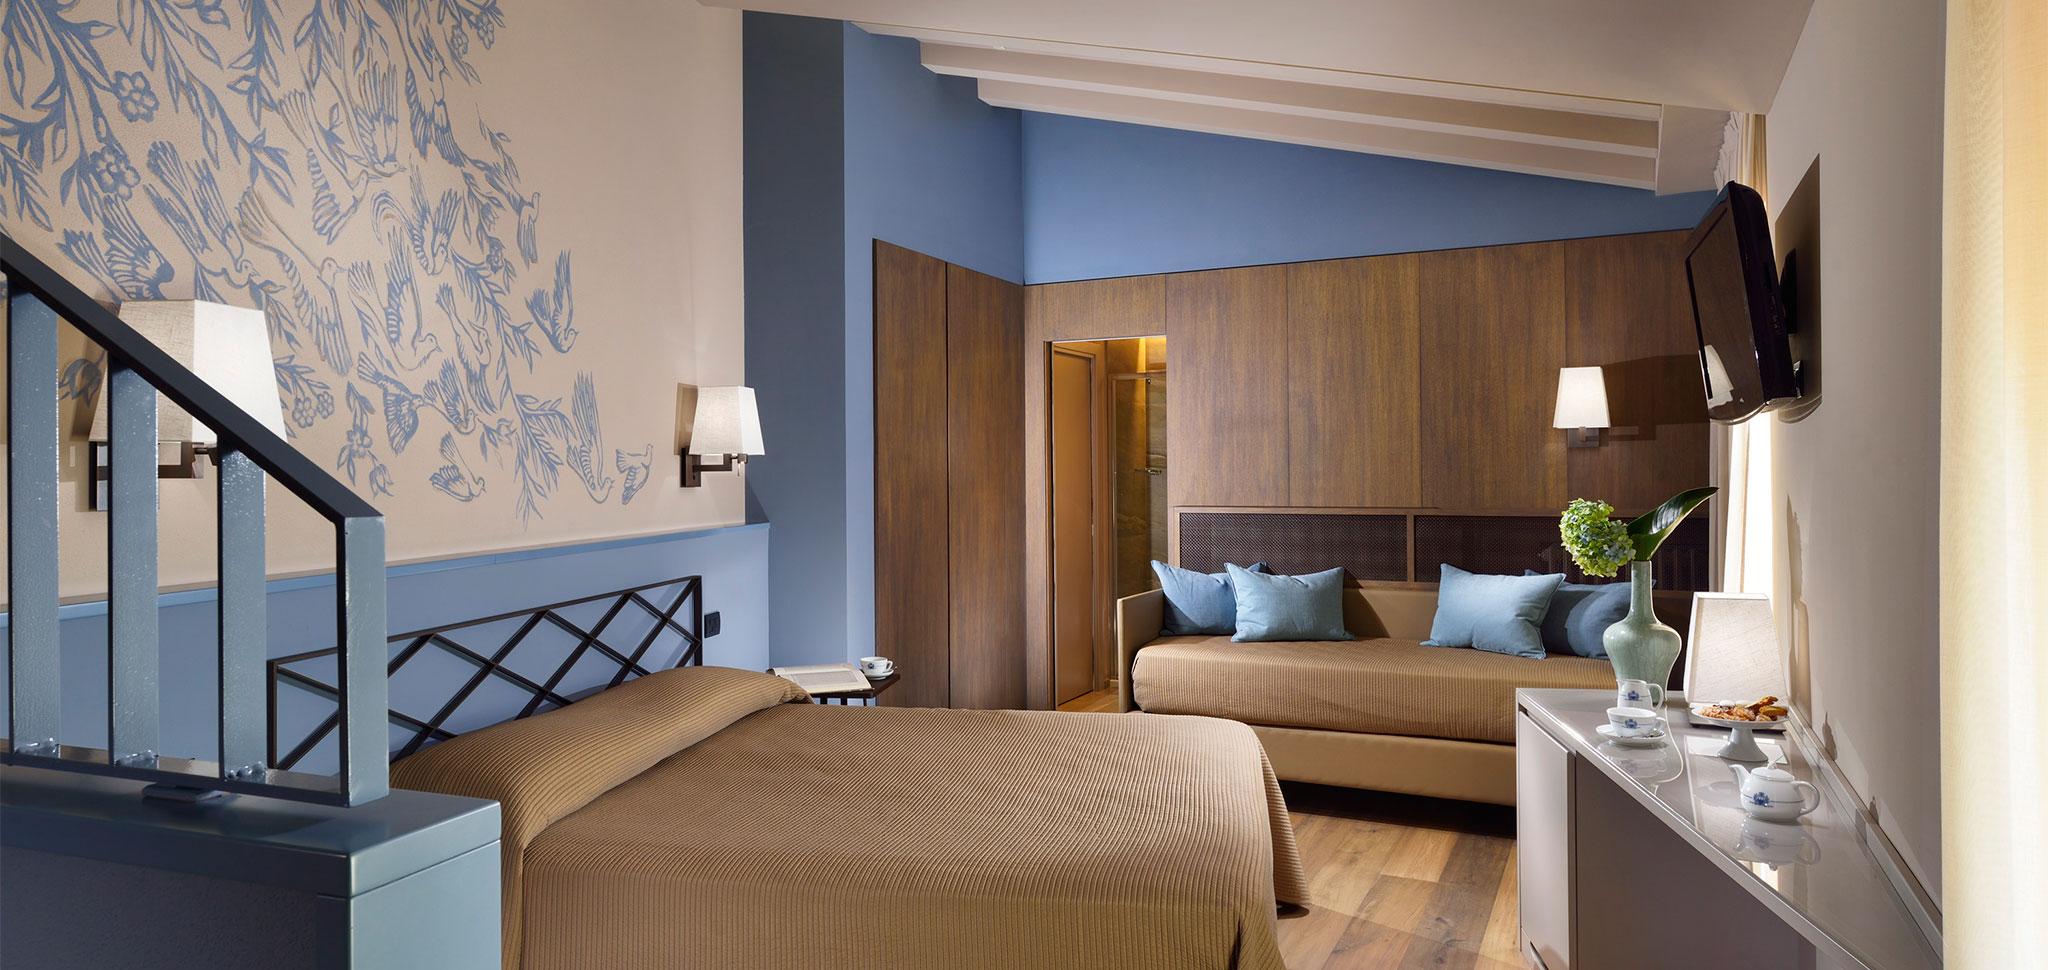 Photogallery | Titano Suites Hotel San Marino | GHSM Group